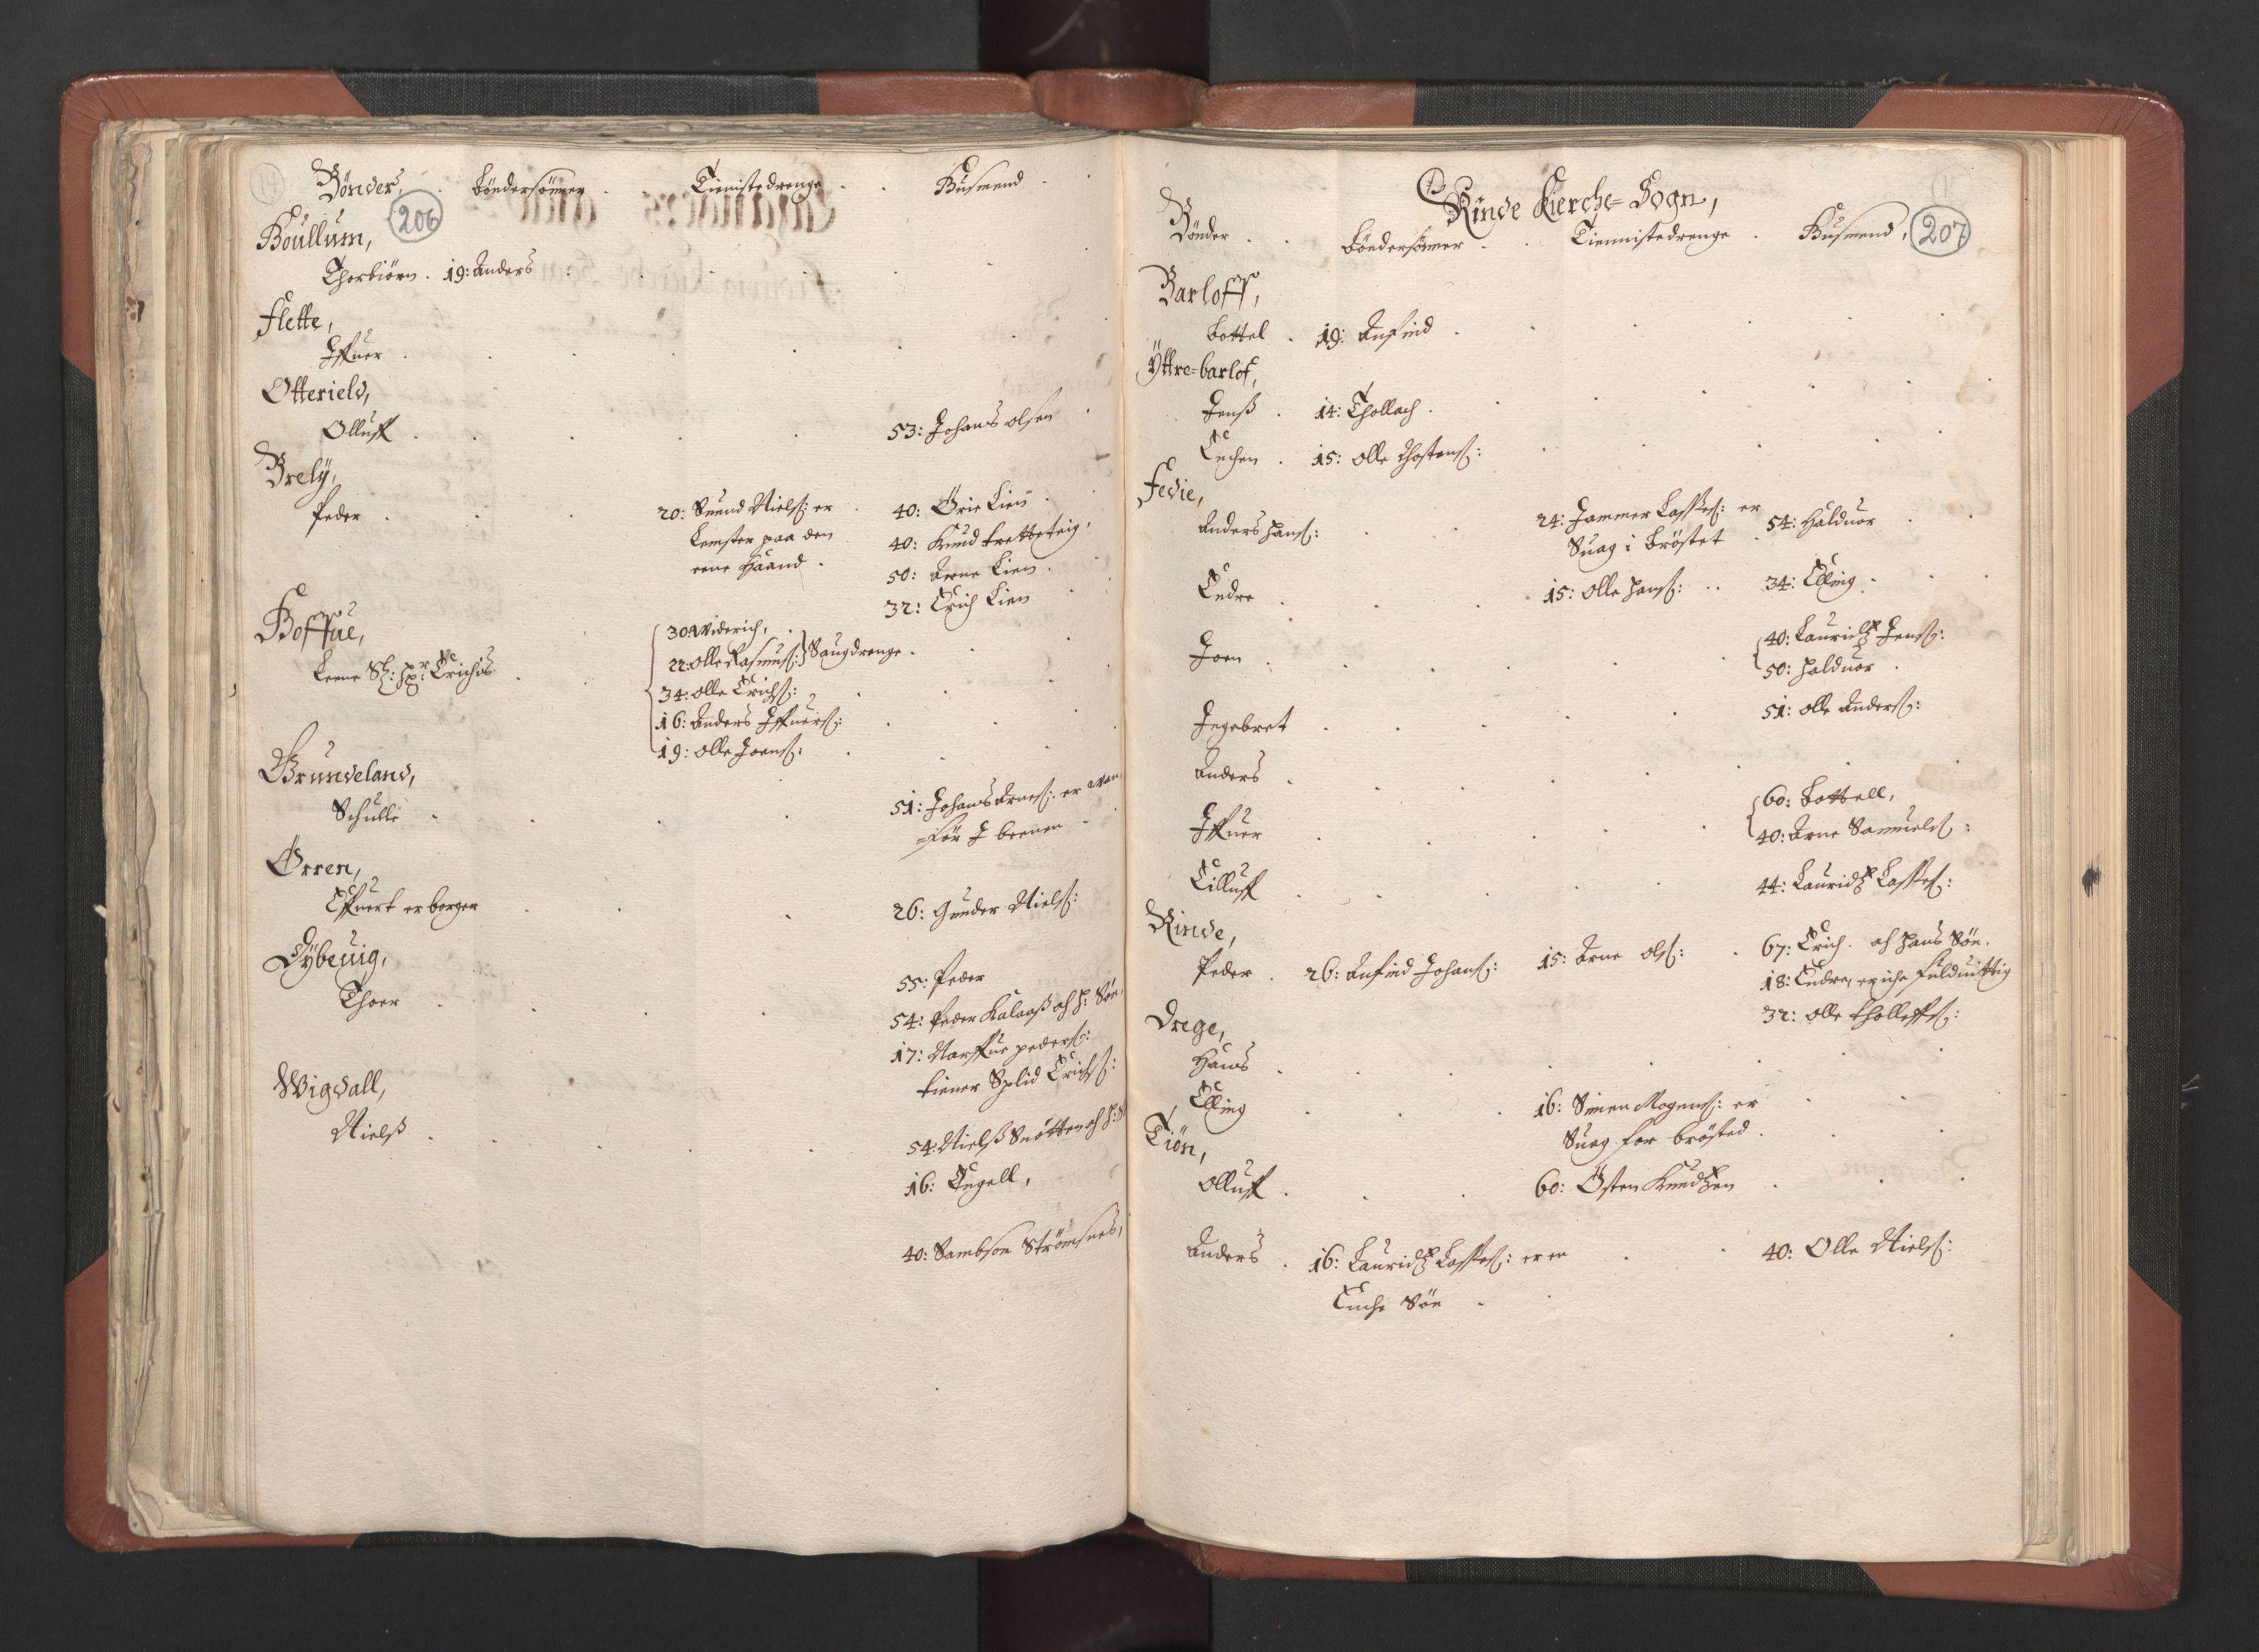 RA, Fogdenes og sorenskrivernes manntall 1664-1666, nr. 14: Hardanger len, Ytre Sogn fogderi og Indre Sogn fogderi, 1664-1665, s. 206-207